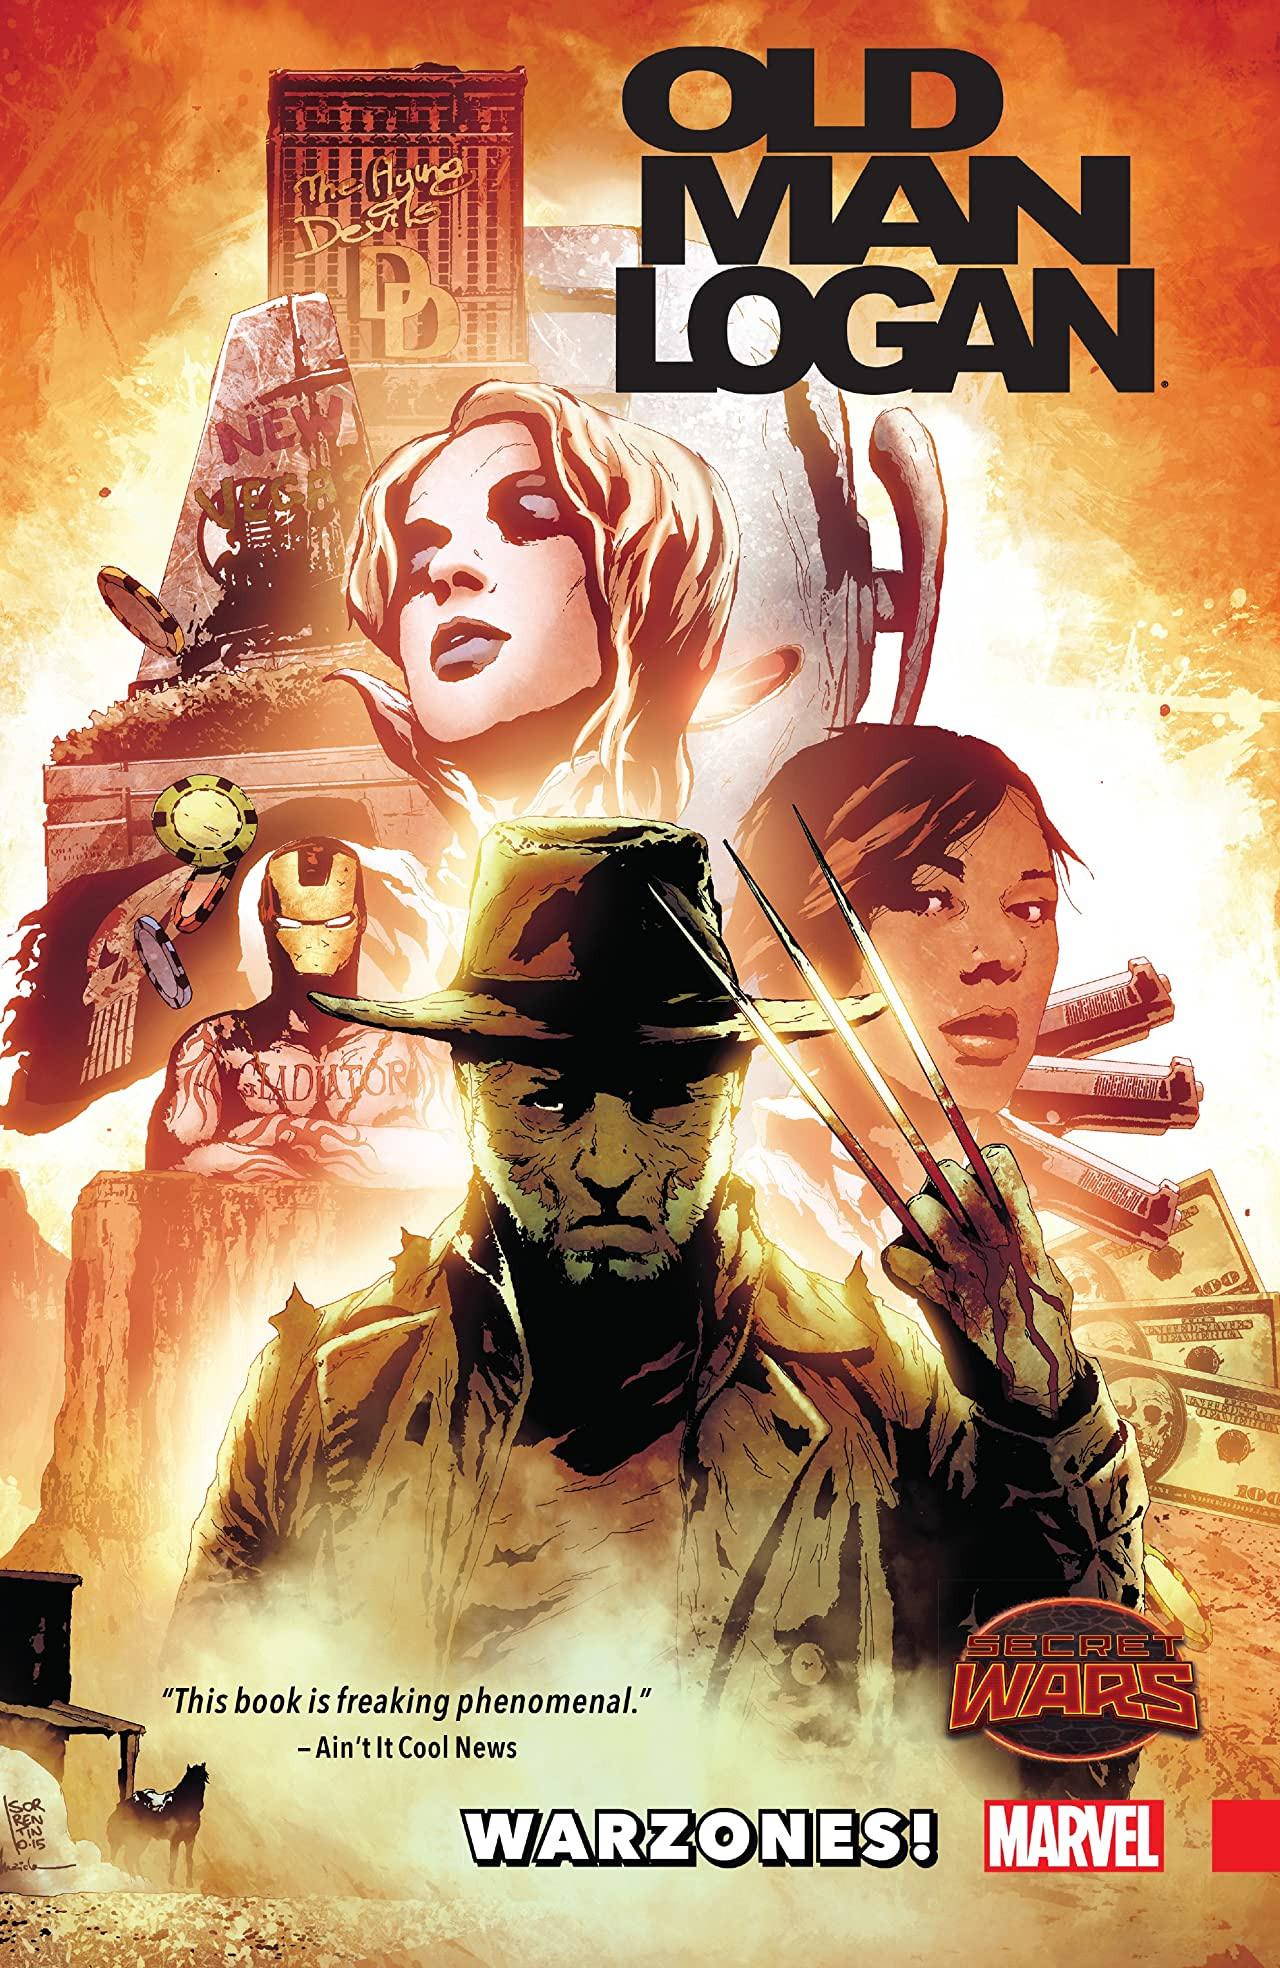 Wolverine: Old Man Logan TPB Vol 1 0: Warzones!